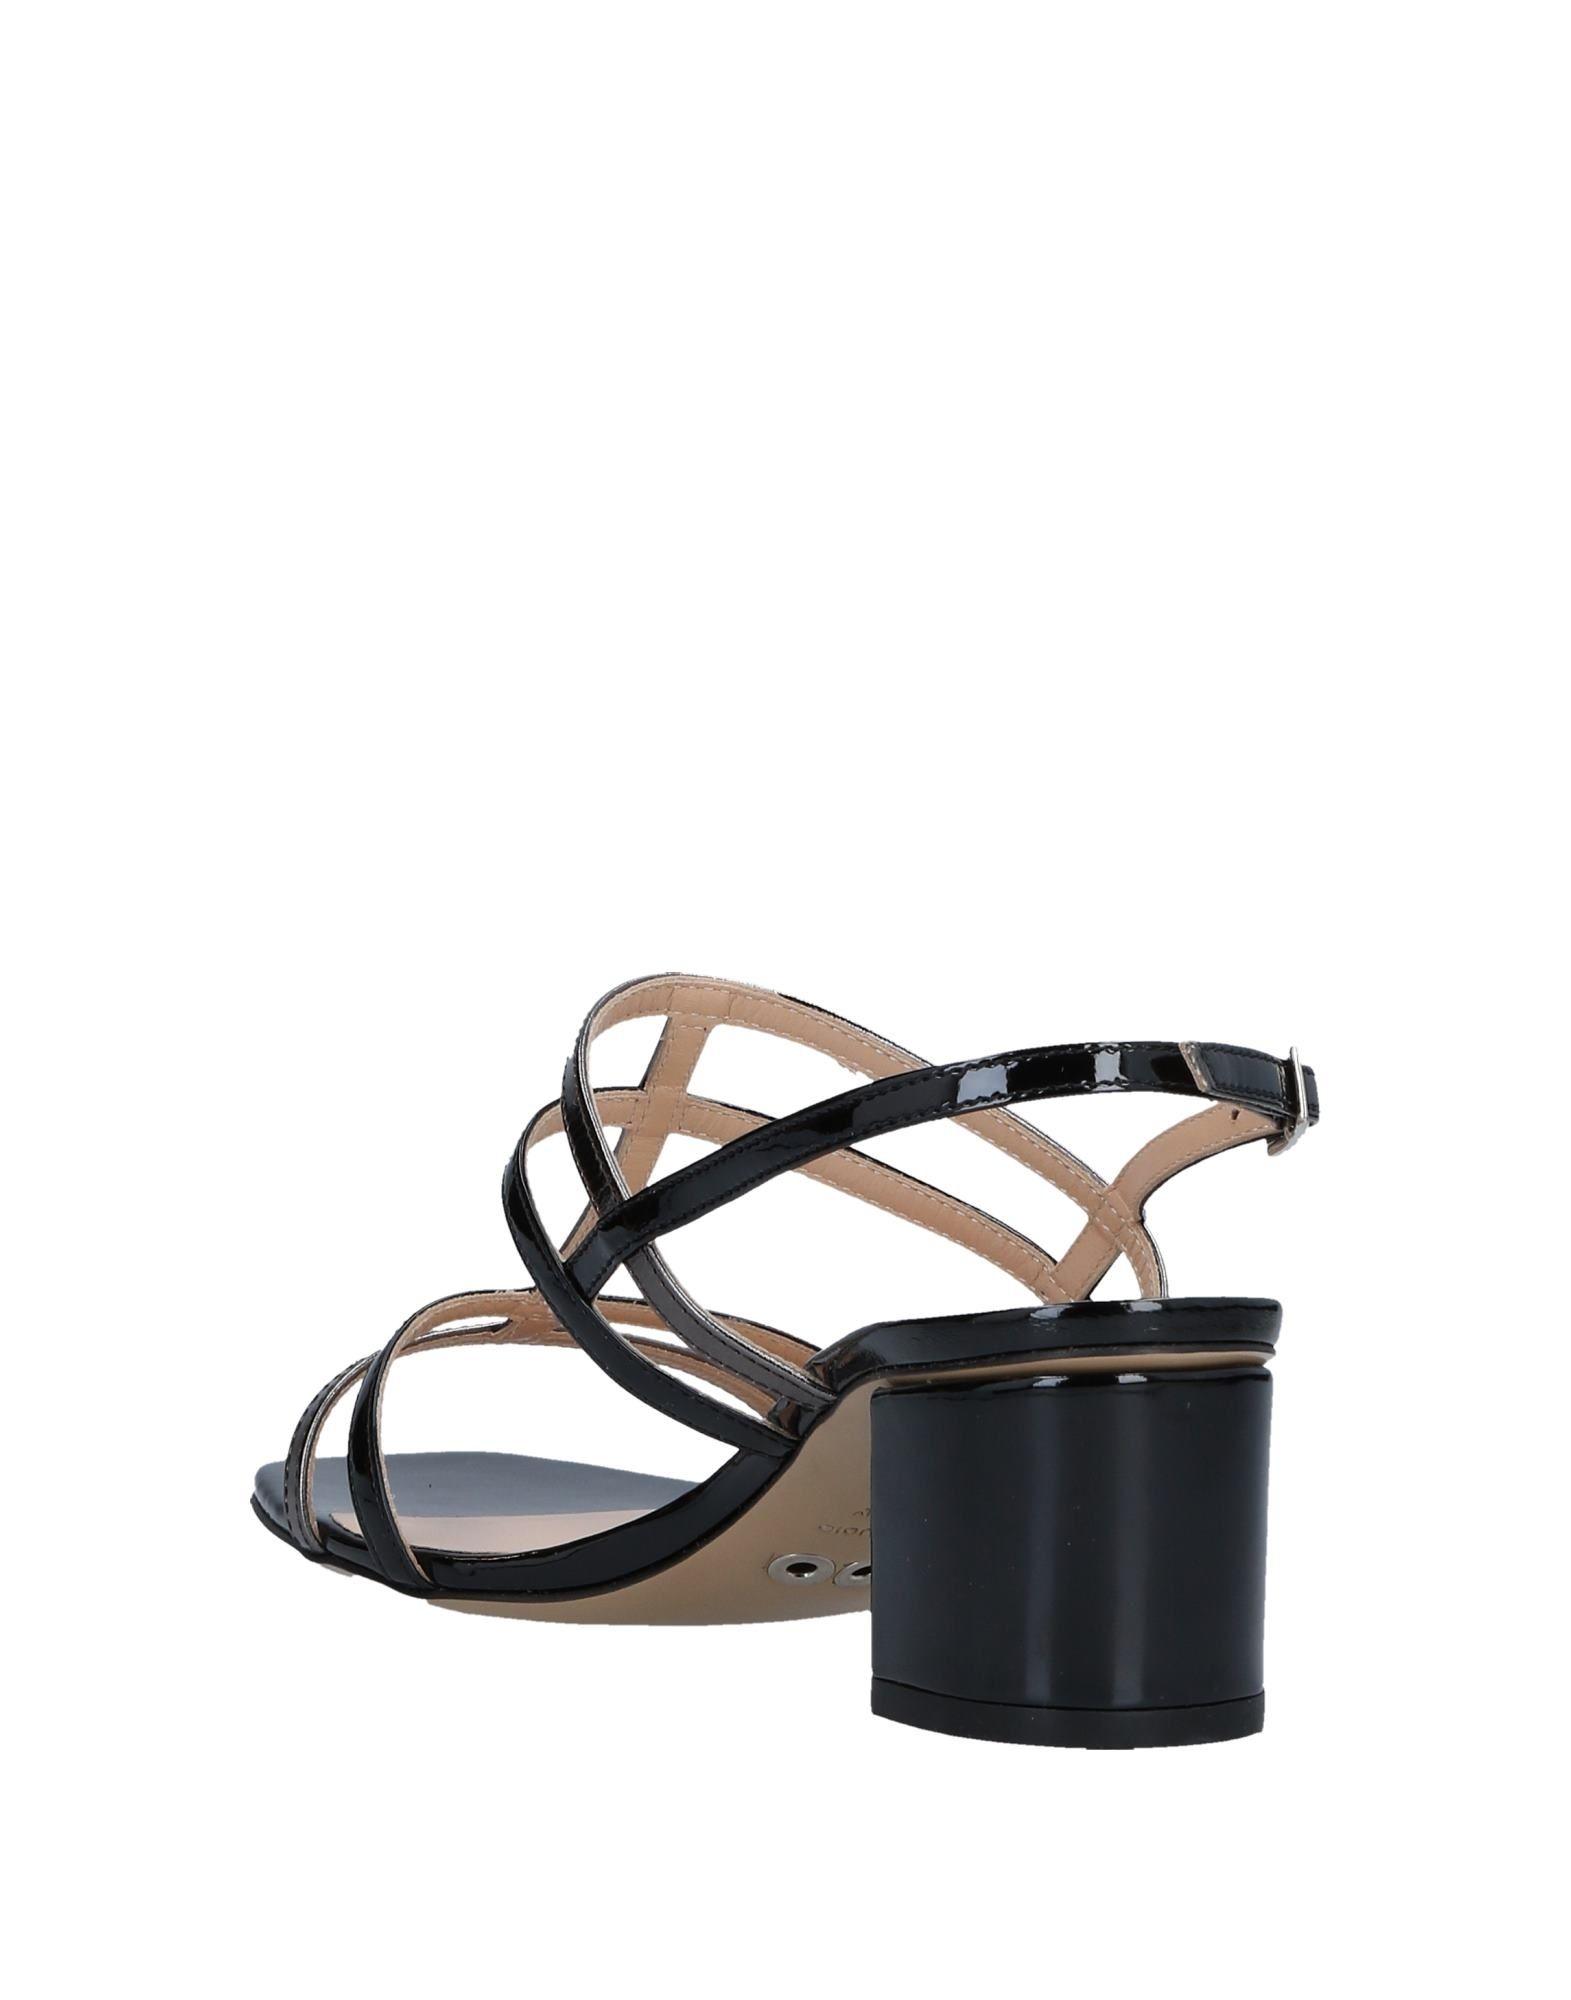 Gut um Sandalen billige Schuhe zu tragenChon Per Mario Zamagna Sandalen um Damen  11527439BM 99c34e